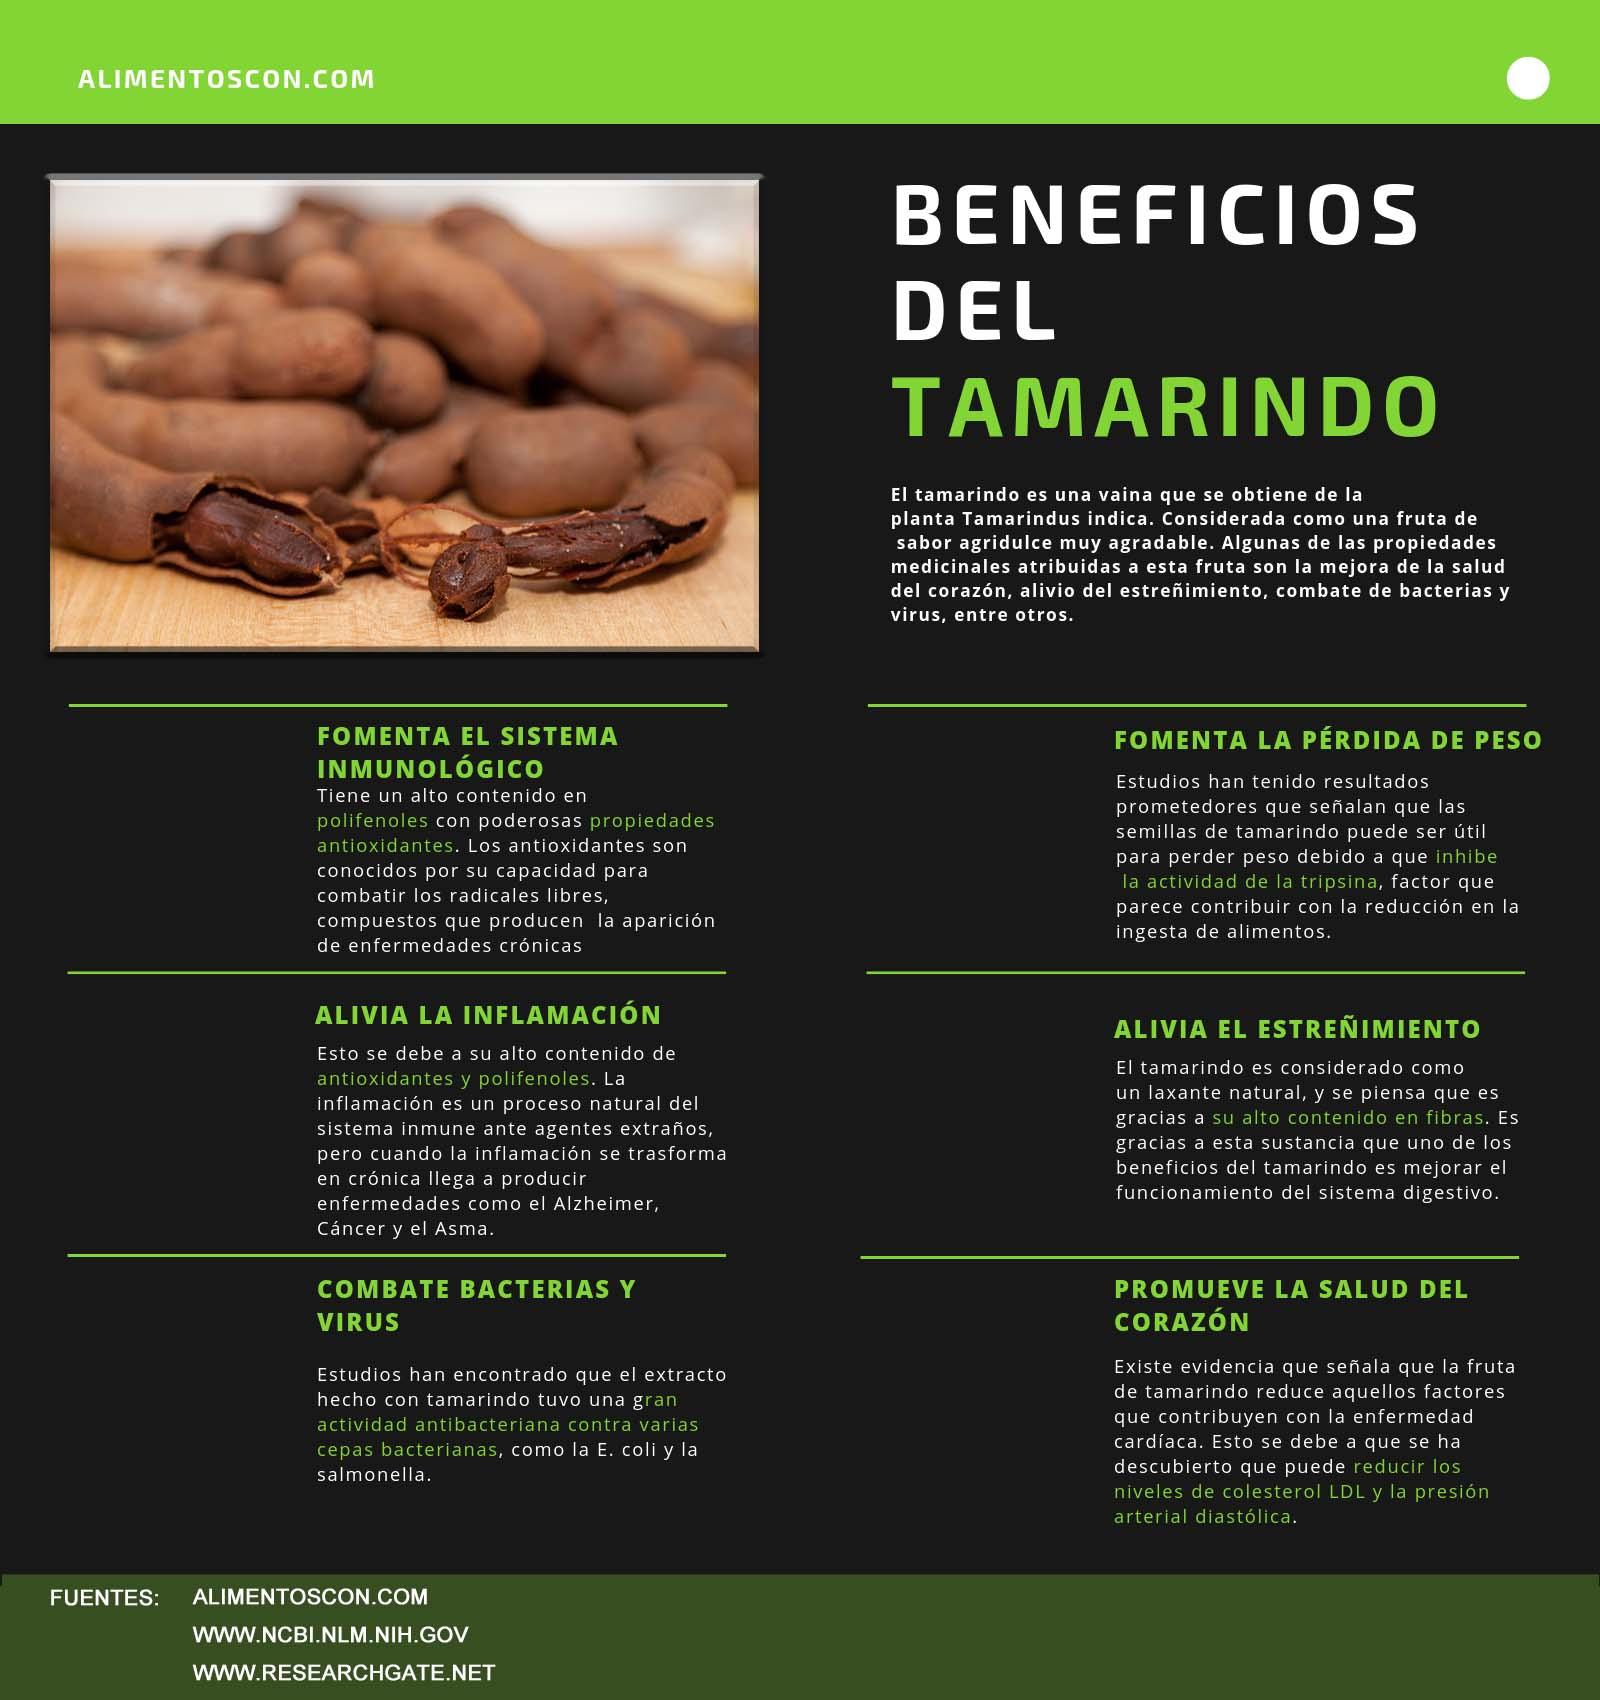 infografia beneficios del tamarindo